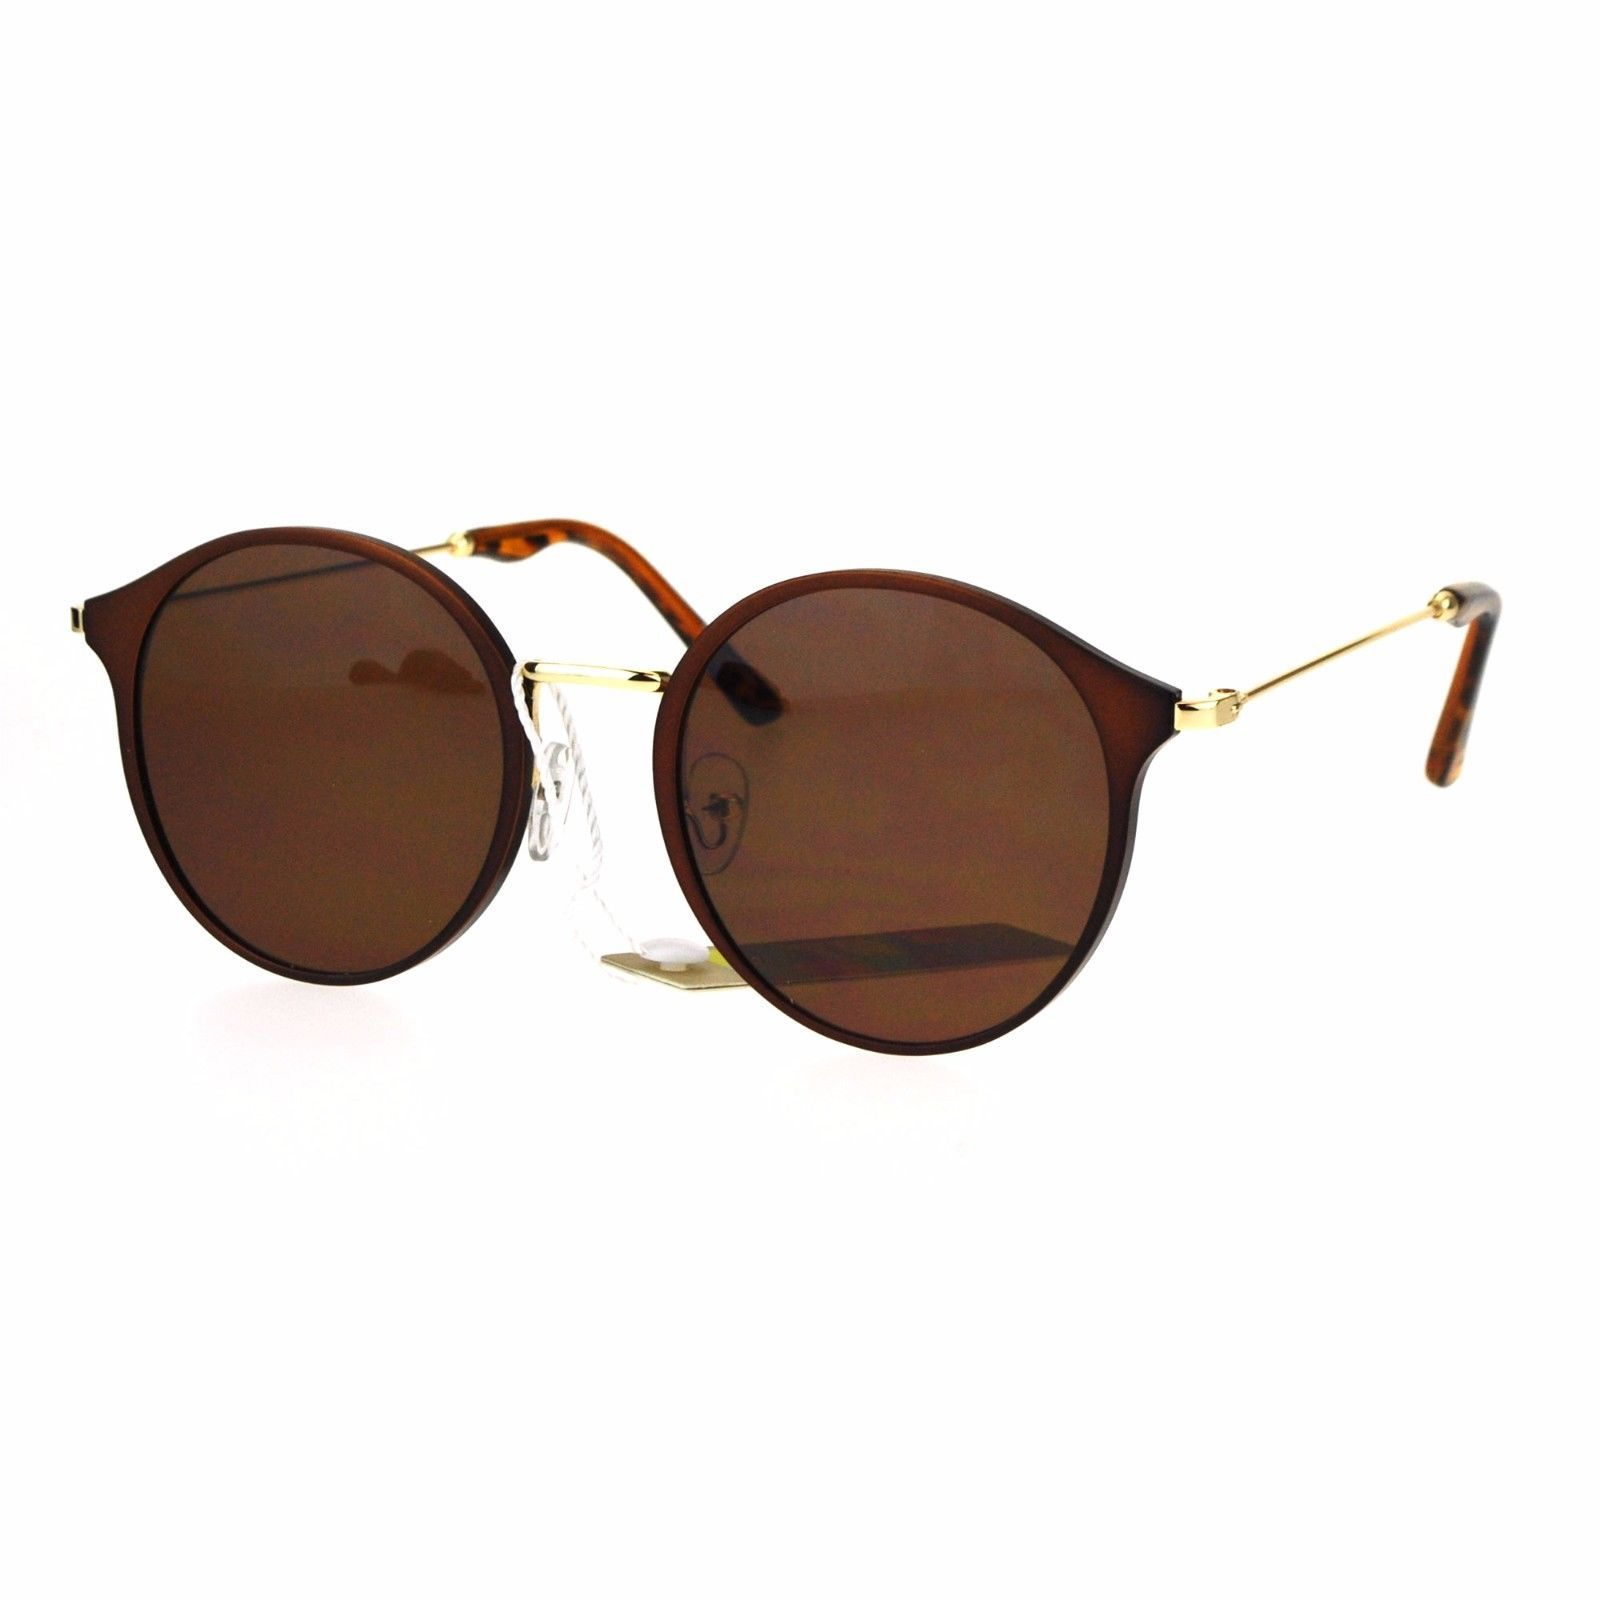 Womens Fashion Sunglasses Matted Metallic Finish Round Frame UV 400